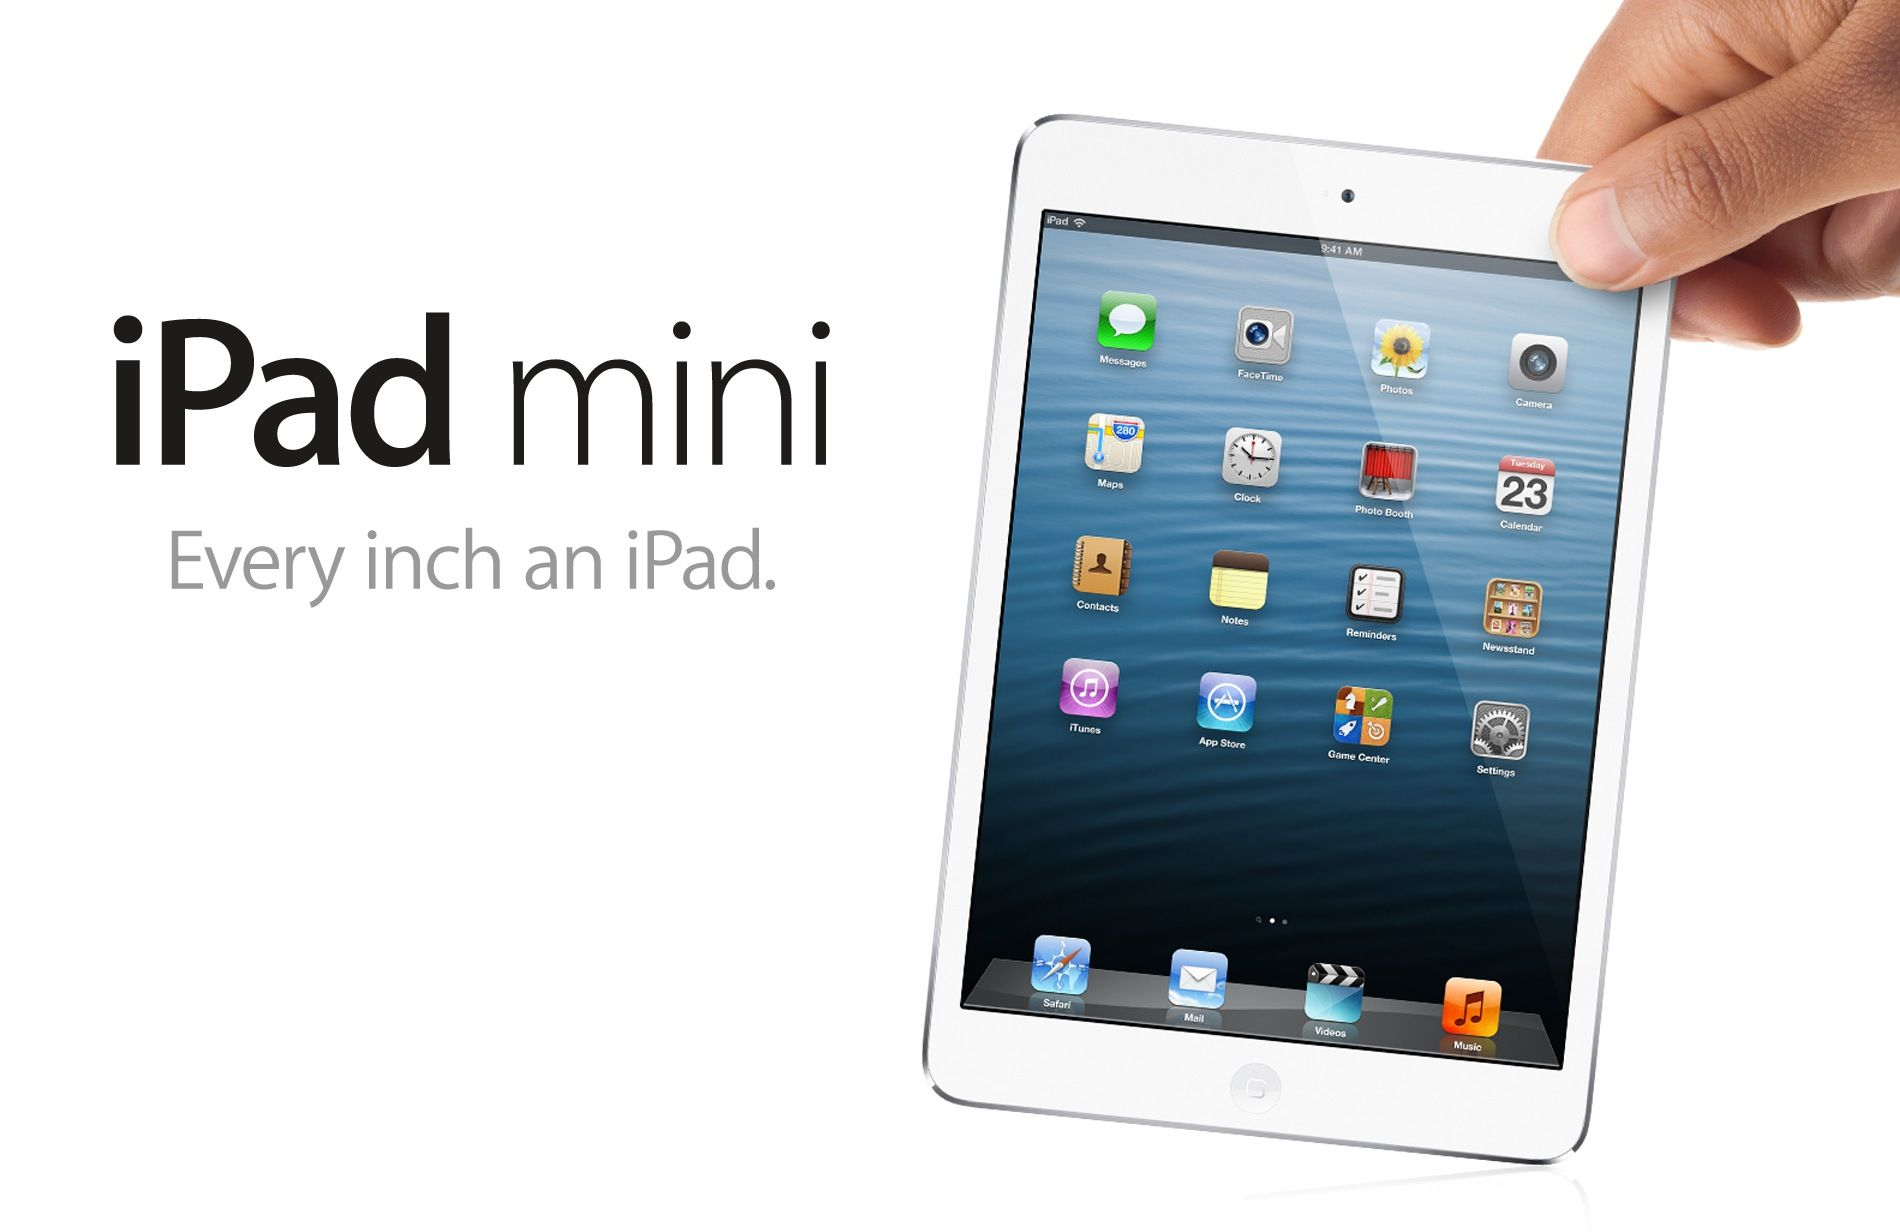 Ipad Mini Reservations Can Be Made On Apple S Website After 10 P M The Tech Journal Ipad Mini Apple Ipad Mini Mini Tablet